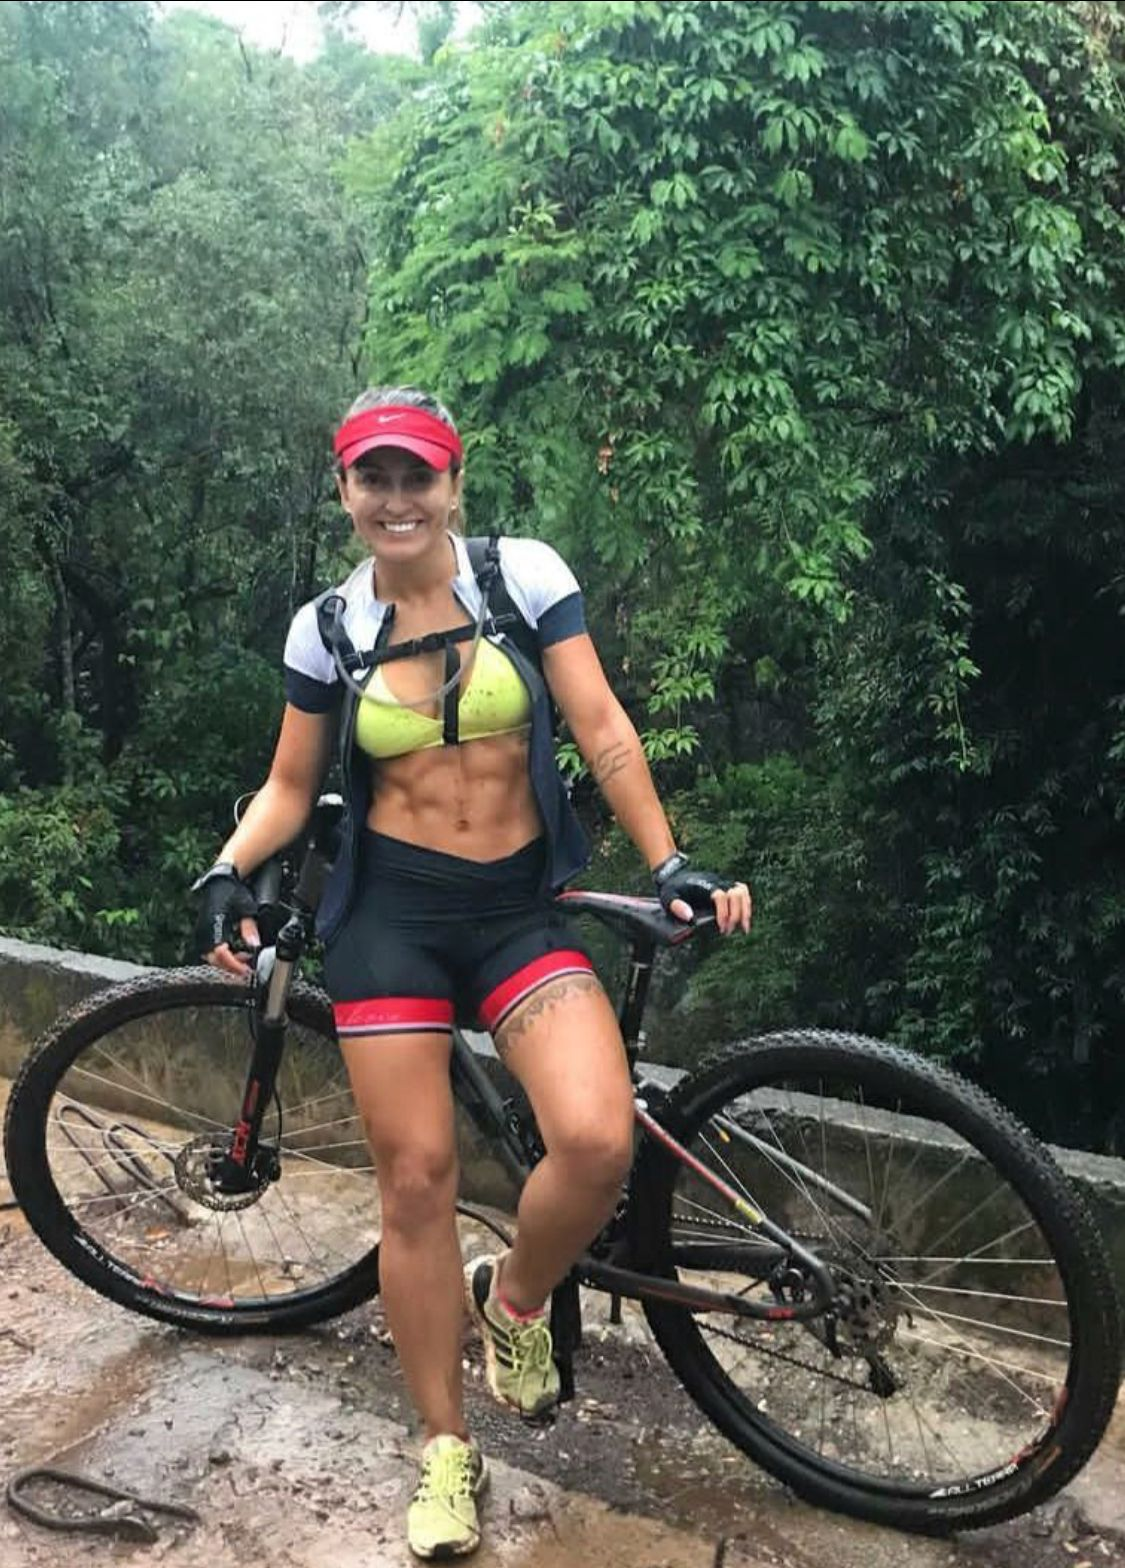 cce104ab4b8 Trail riding  sunglasses  heavyglare https   shop.heavyglare.com